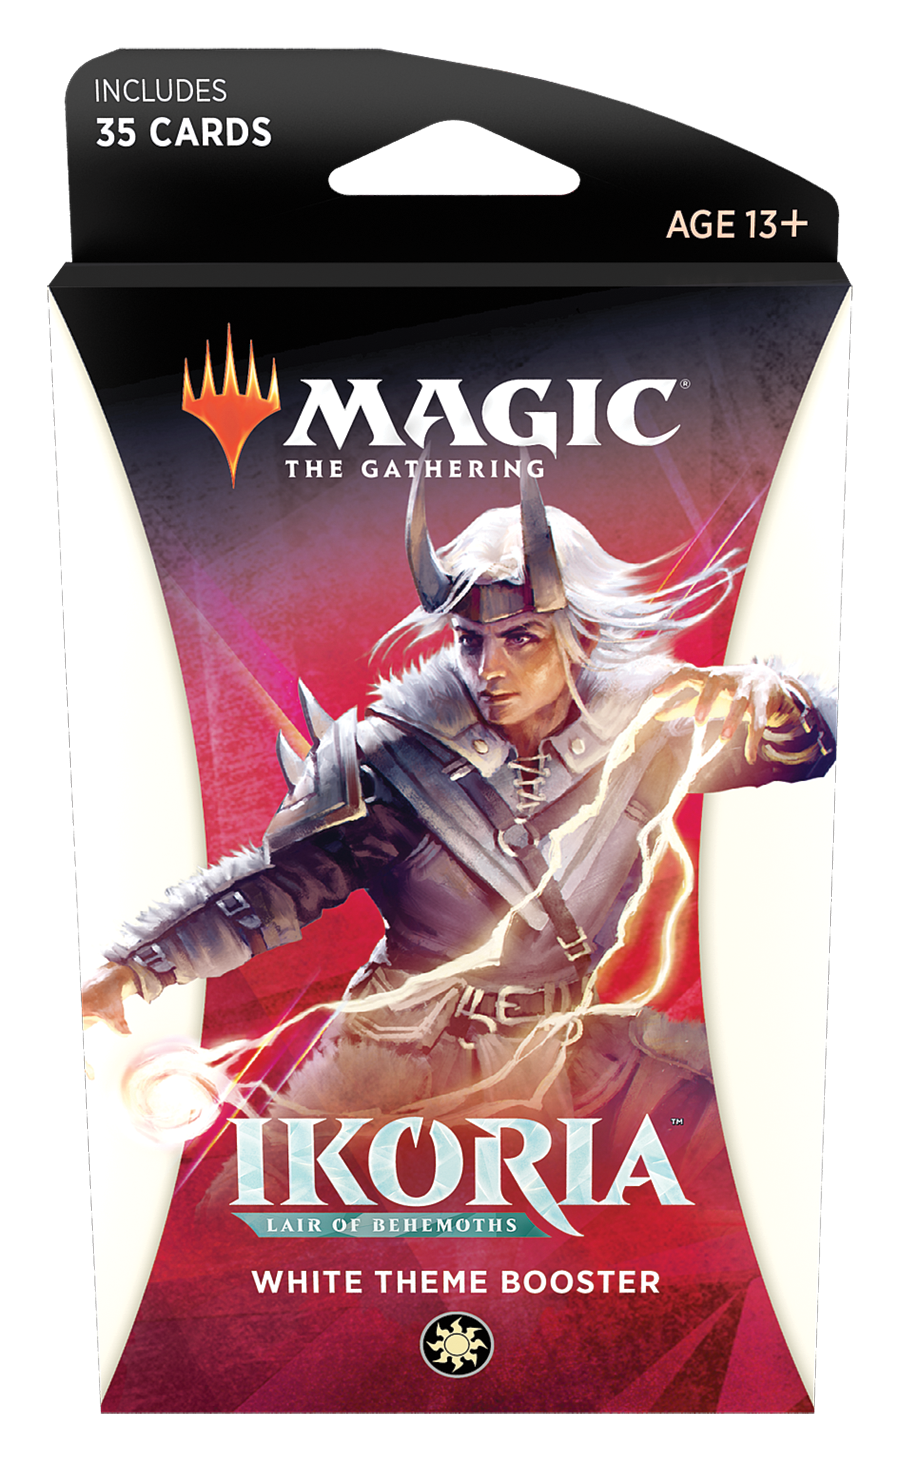 Magic the Gathering: Ikoria: Lair of Behemoths - Theme Booster White image